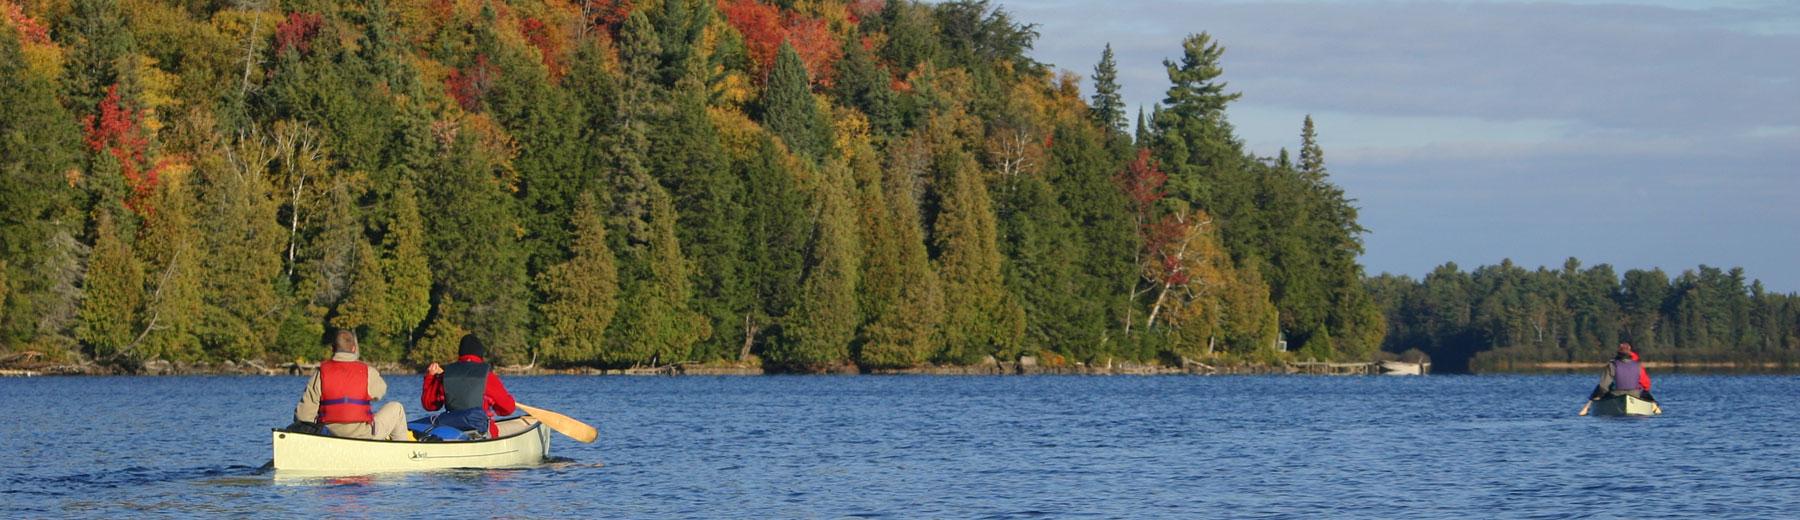 Rock Lake, Algonquin Park, Ontario